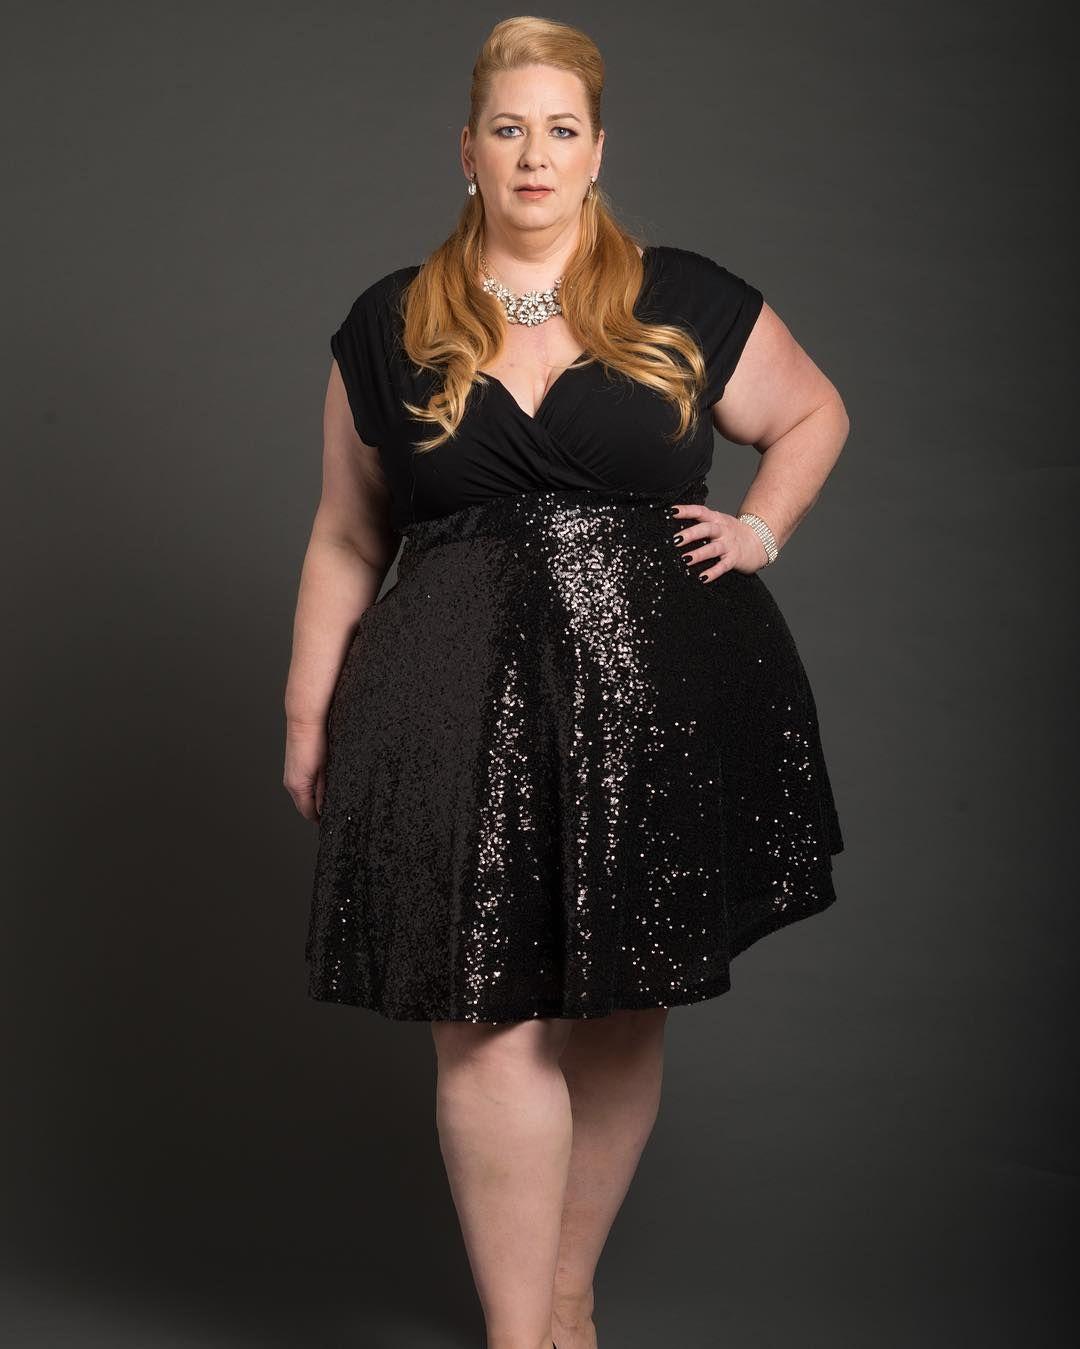 @torridfashion brand I can always count on, to make this curvy body look spectacular:)  @lesleypedraza  @mua_claudia . . . .   #claudiafloraunce   #austrianbeauty   #plusmodel   #loveyourbody    #thatsdarling   #aboutalook    #psmodel    #daretowear    #plusmodelmag    #stylefilesplus    #celebratemysize   #fullfigured    #myswimbody    #ootd   #psootd   #goldenconfidence   #beautyoverstandards   #iembracemybody   #effyourbeautystandards   #fatandfree   #publicrelation   #bookme   #agent   #